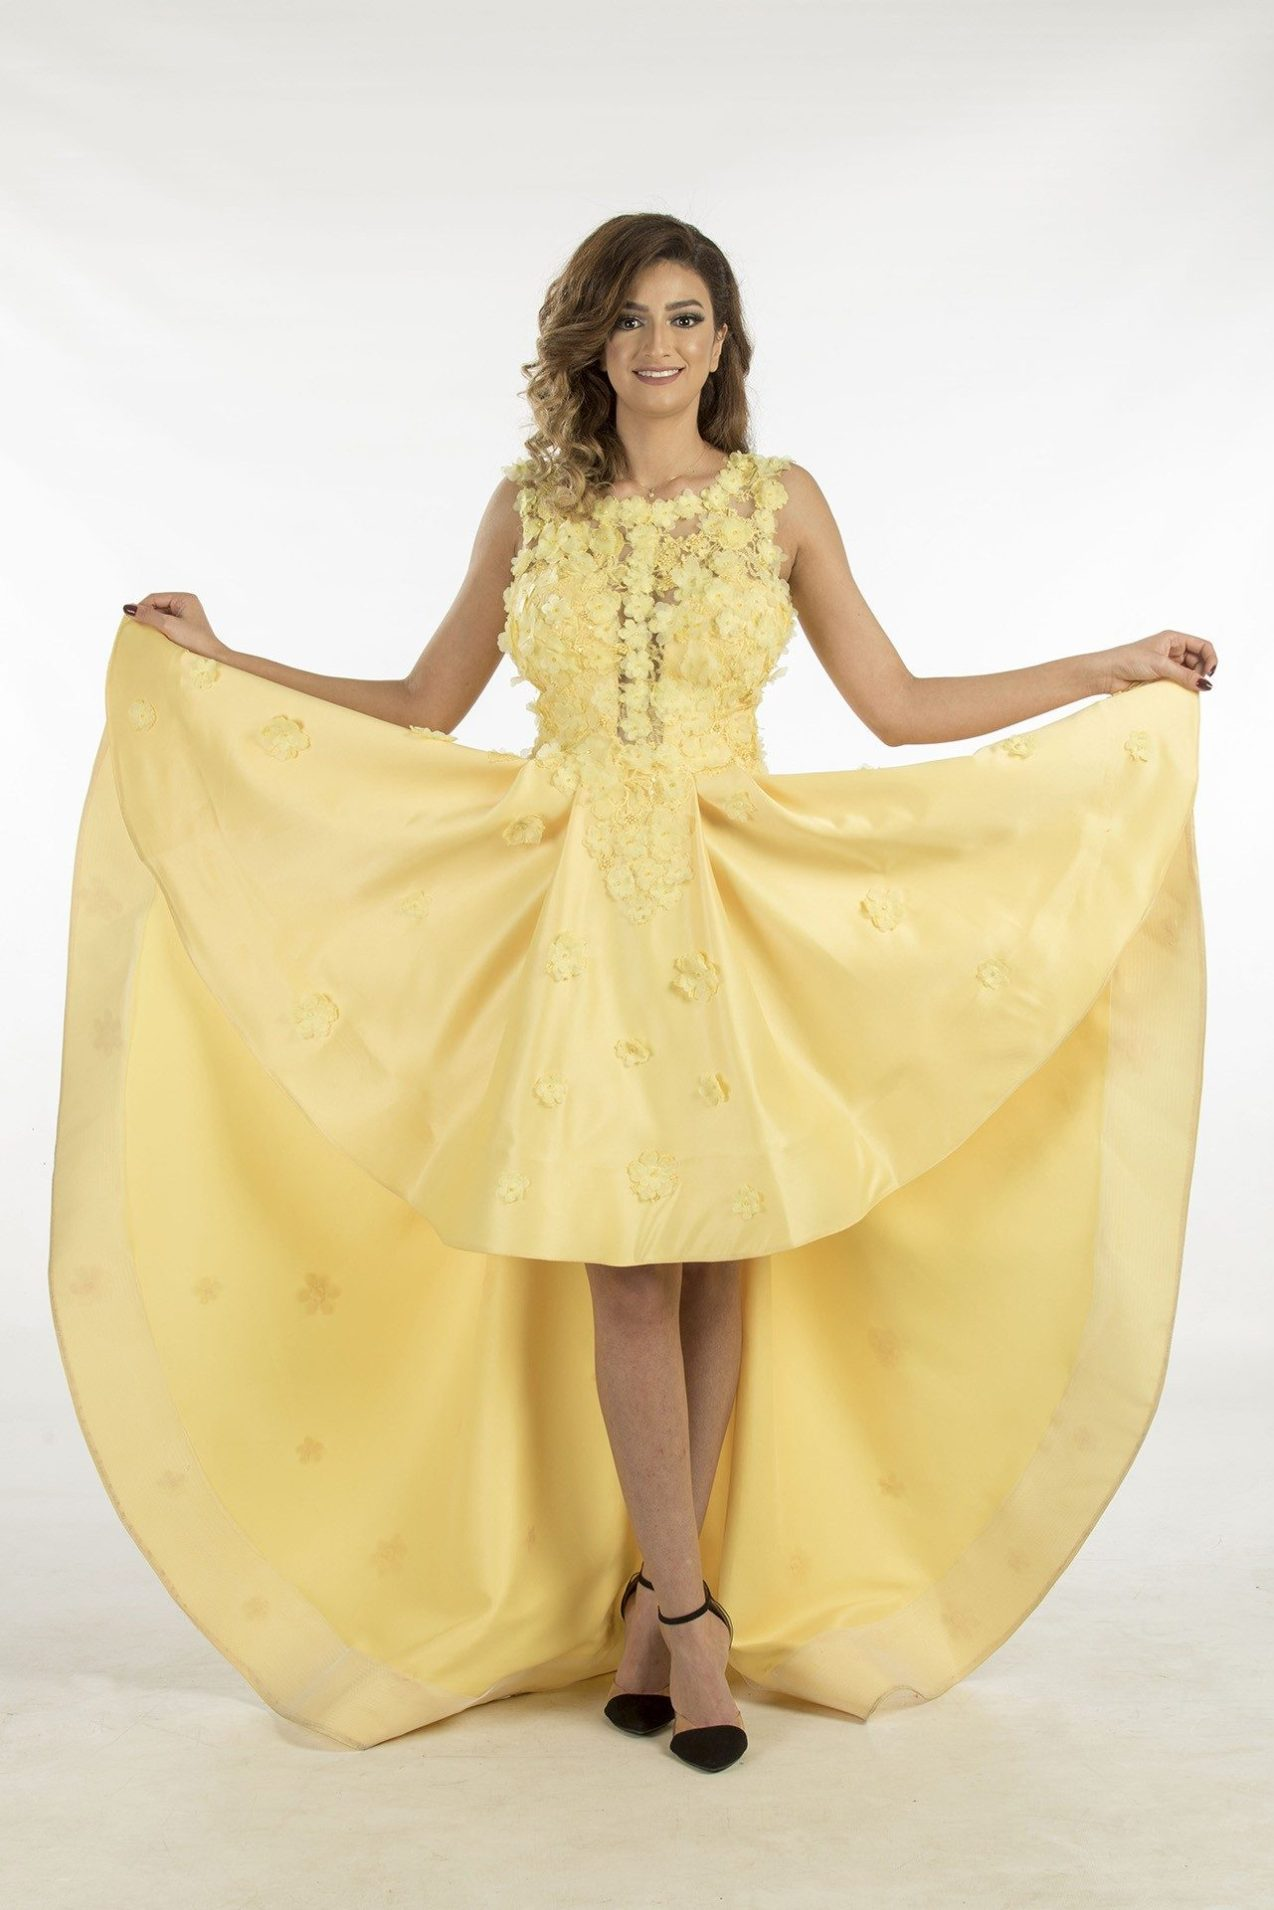 f28f6cff5f11a فستان سهرة قصير من الأمام وطويل من الخلف- صدر وظهر دانتيل مورد ...